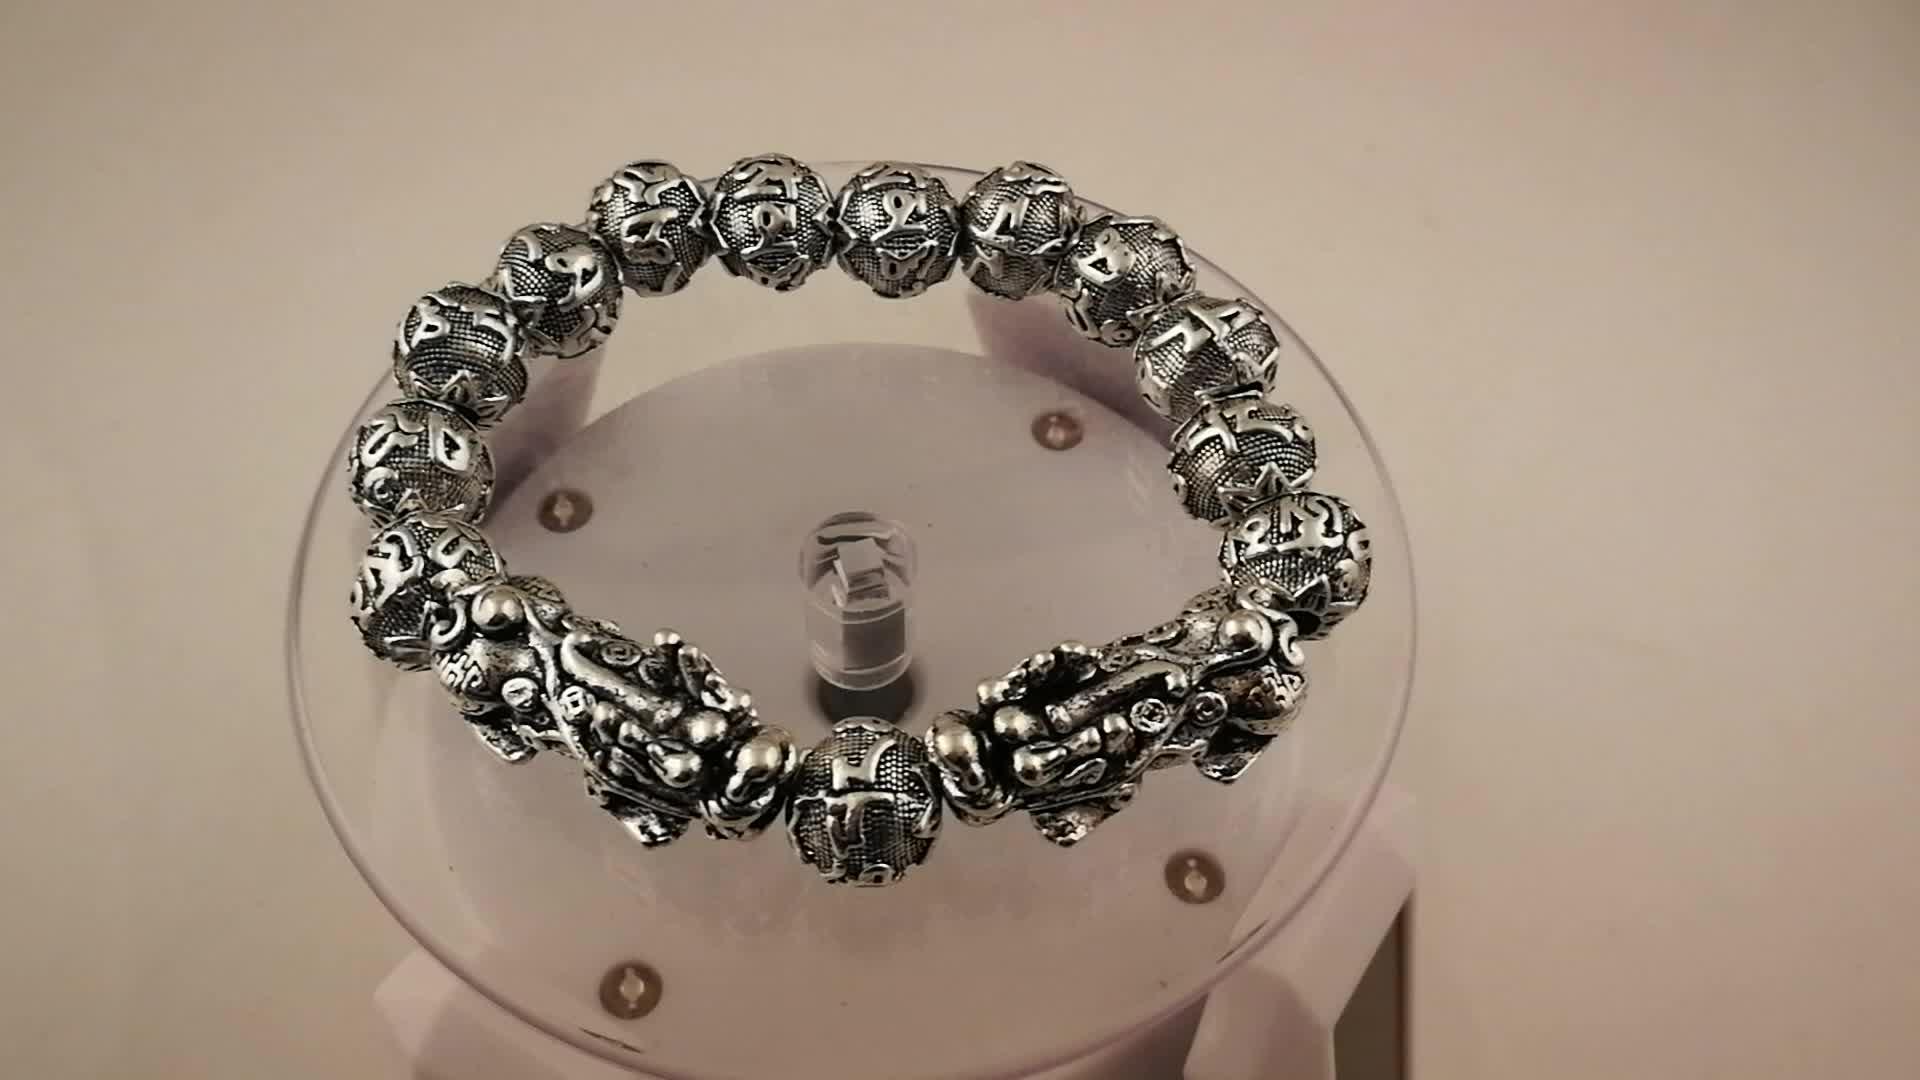 XJ001 Huilin Feng Shui Obsidian Bead Hand Carved Mantra Golden Metal Pi Xiu Pi Yao Bracelet